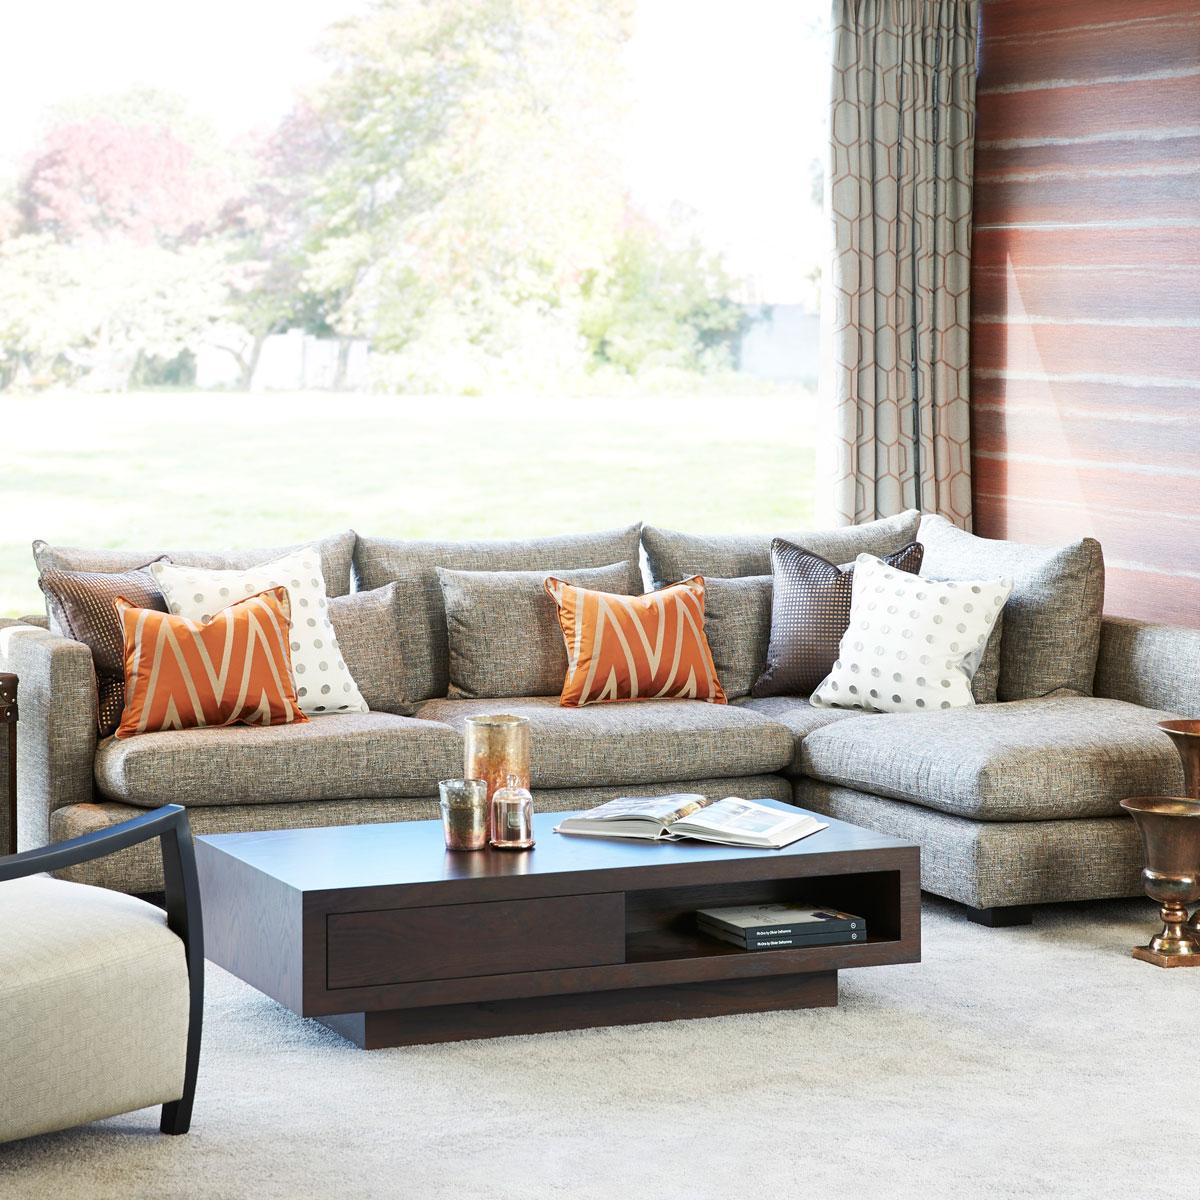 Forma Manox Corner Sofa | McKenzie & WillisMcKenzie & Willis